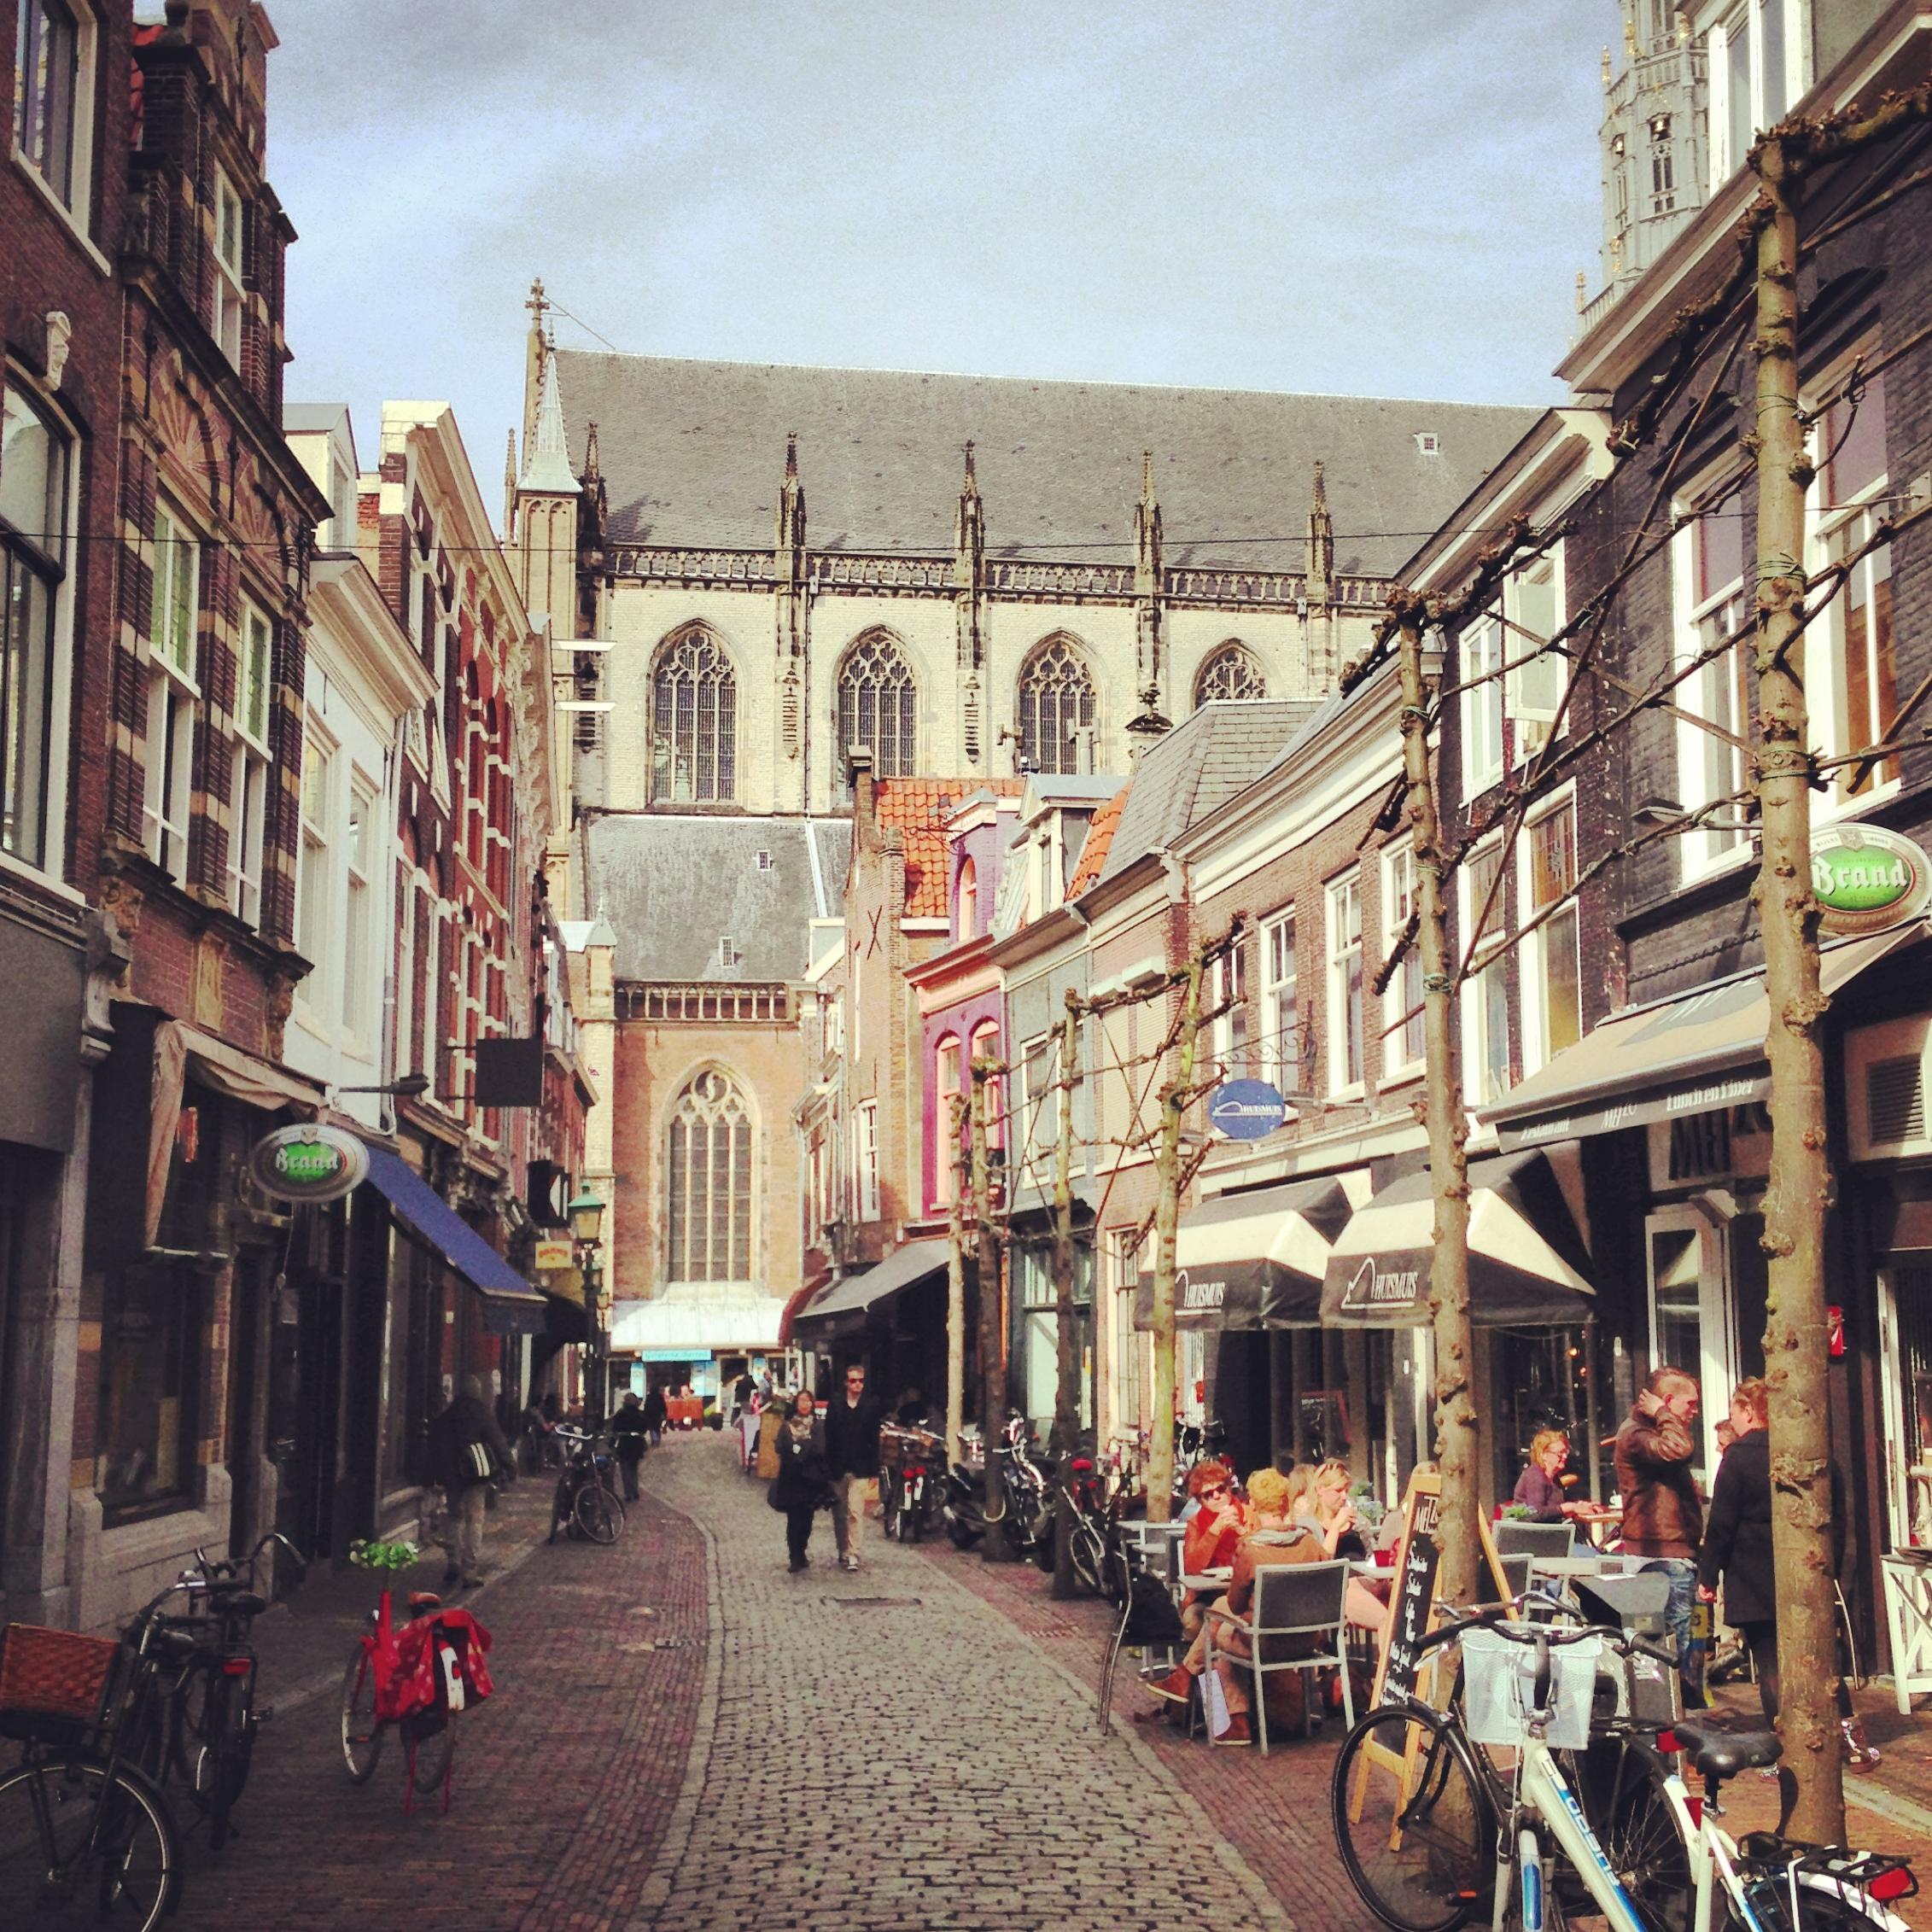 Haarlem, The Netherlands - The Exploress